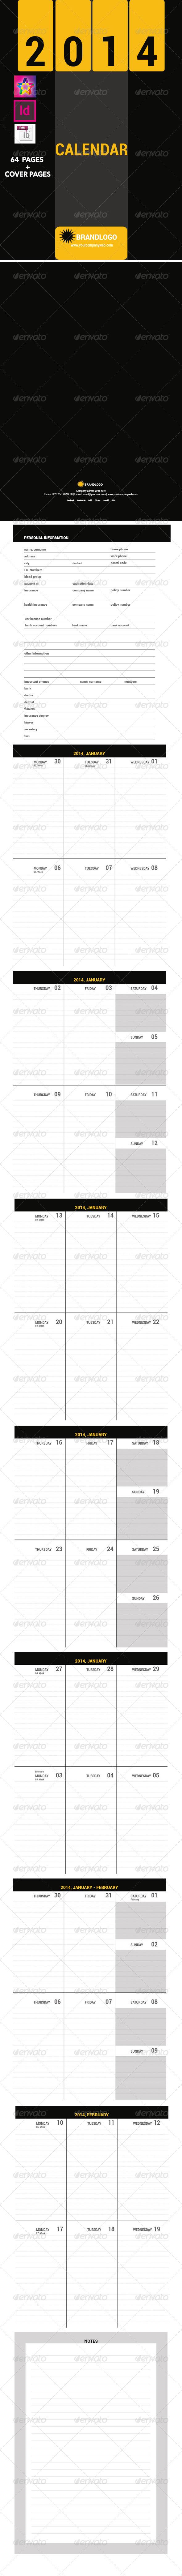 2014 Calendar Organizer Template - Calendars Stationery